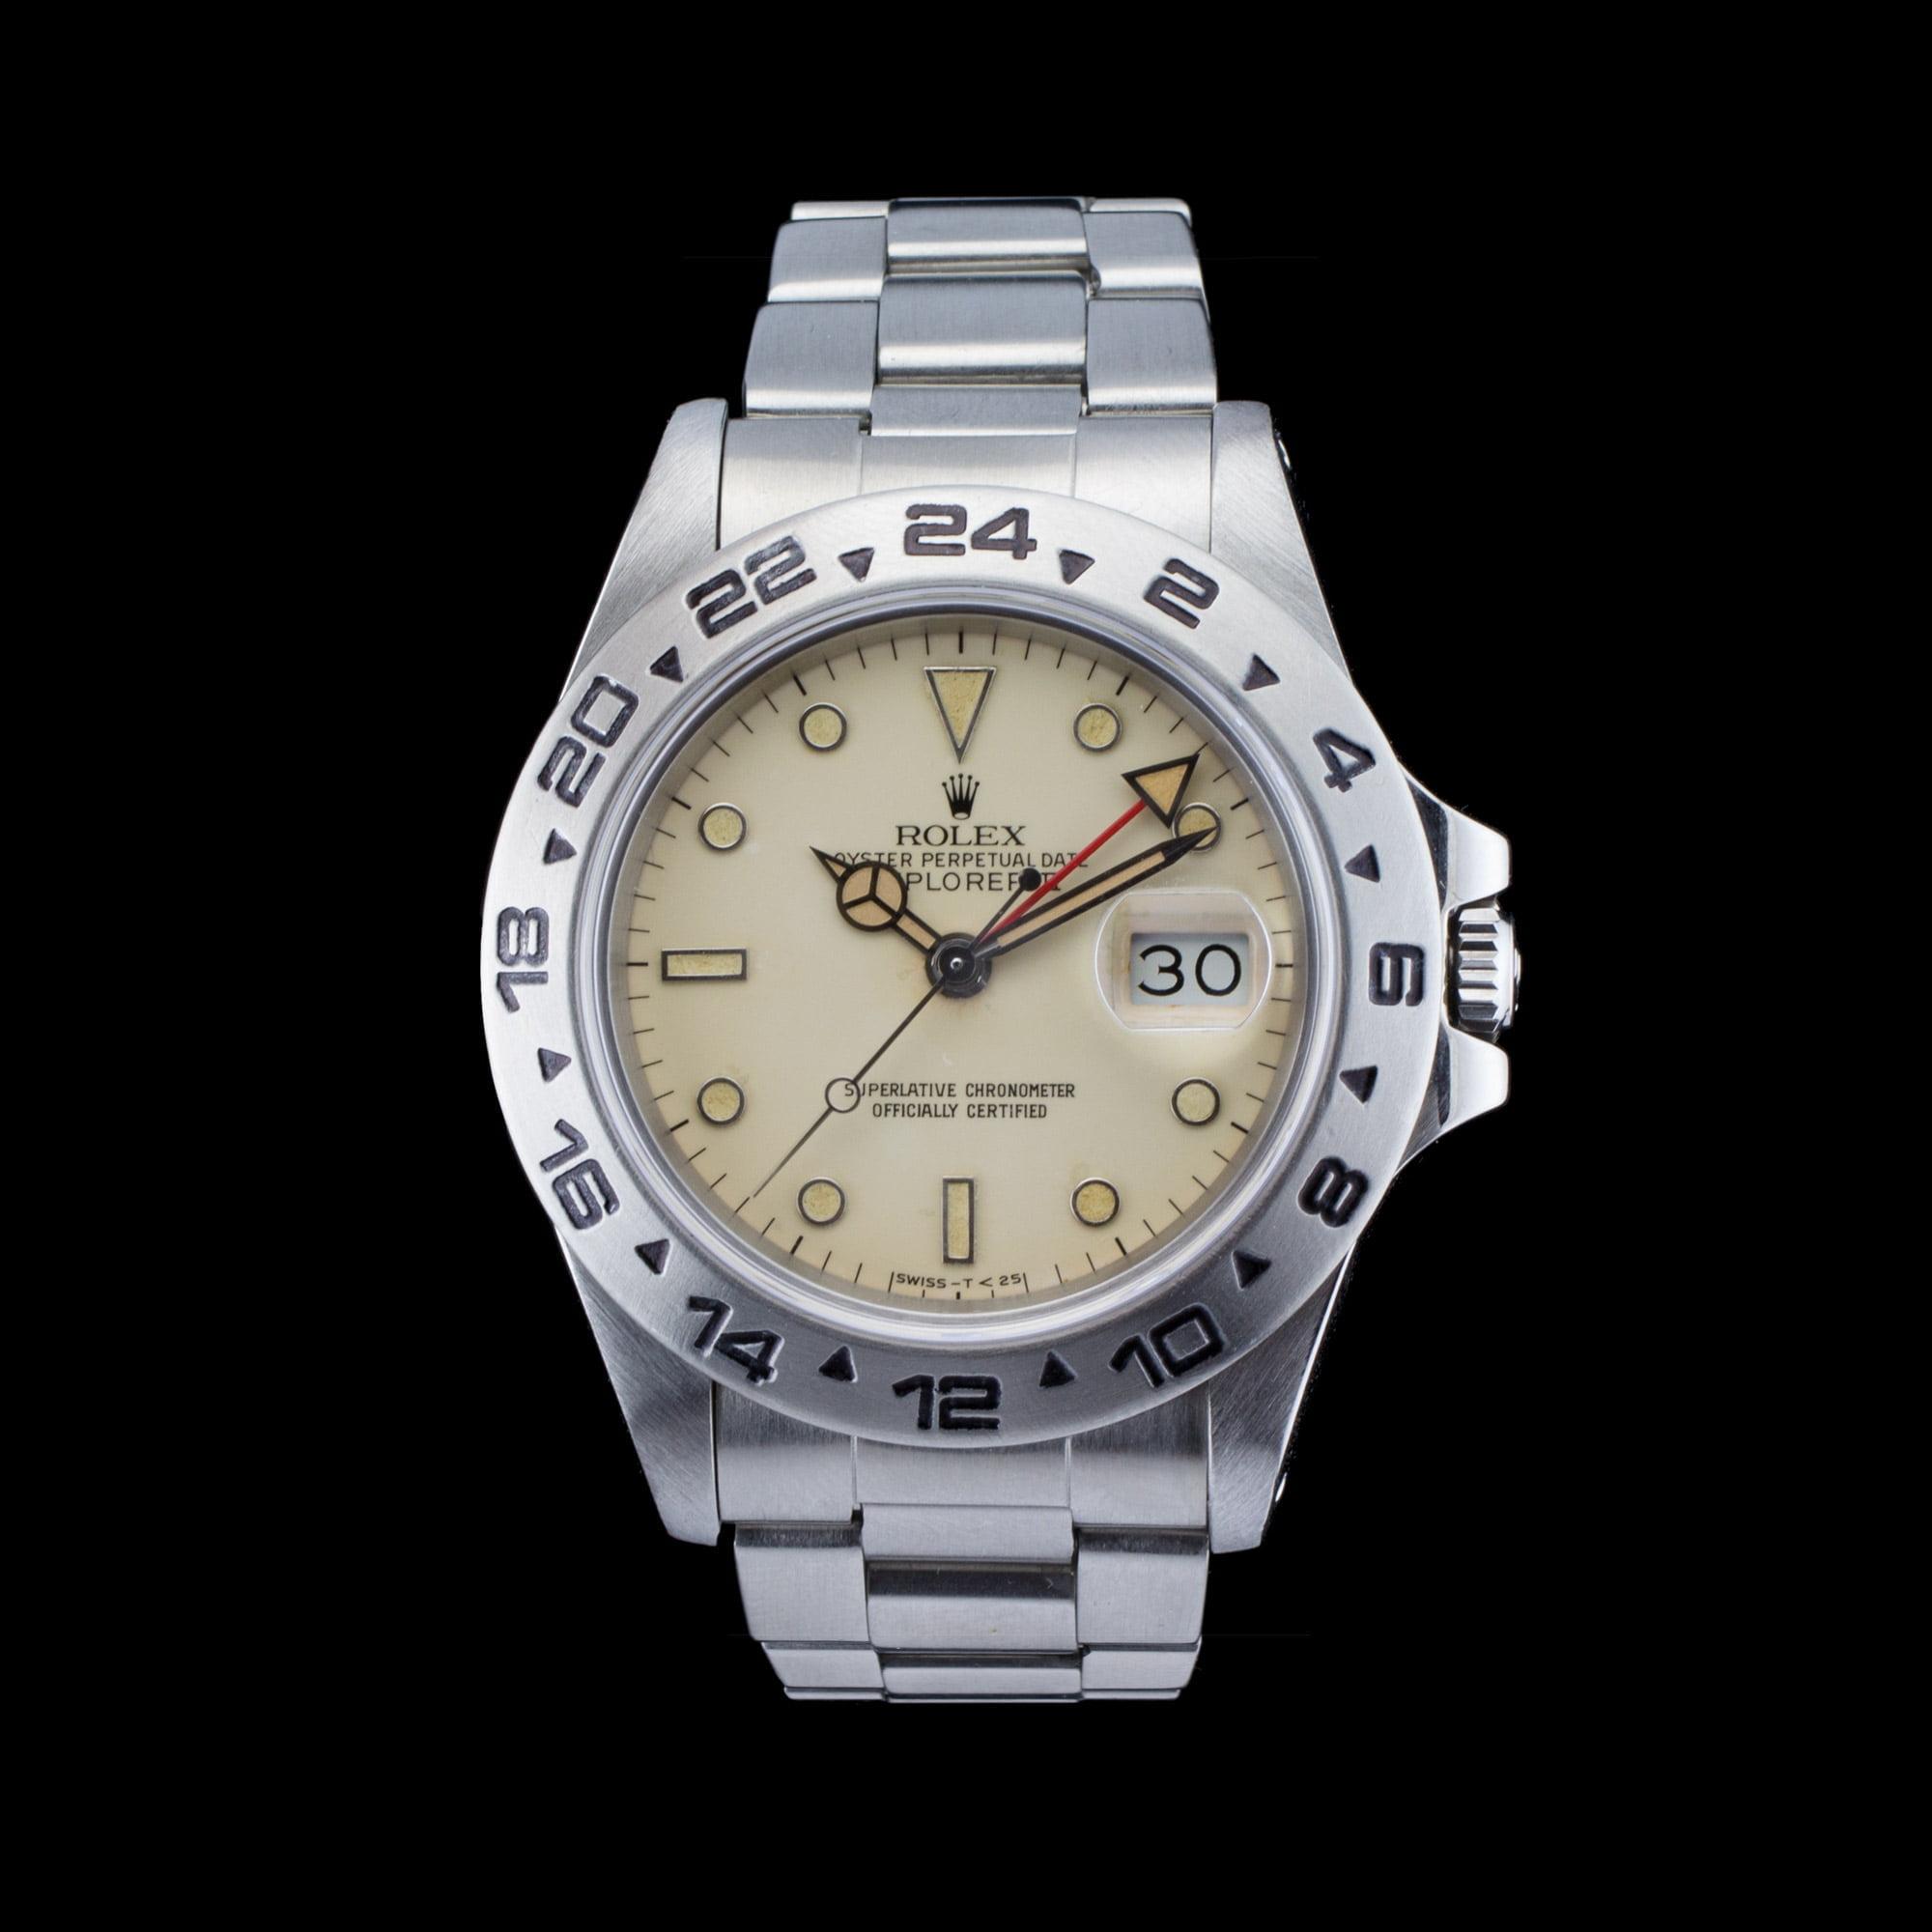 Rolex explorer ii 39 cream rail dial 39 2 amsterdam vintage watches for Rolex explorer